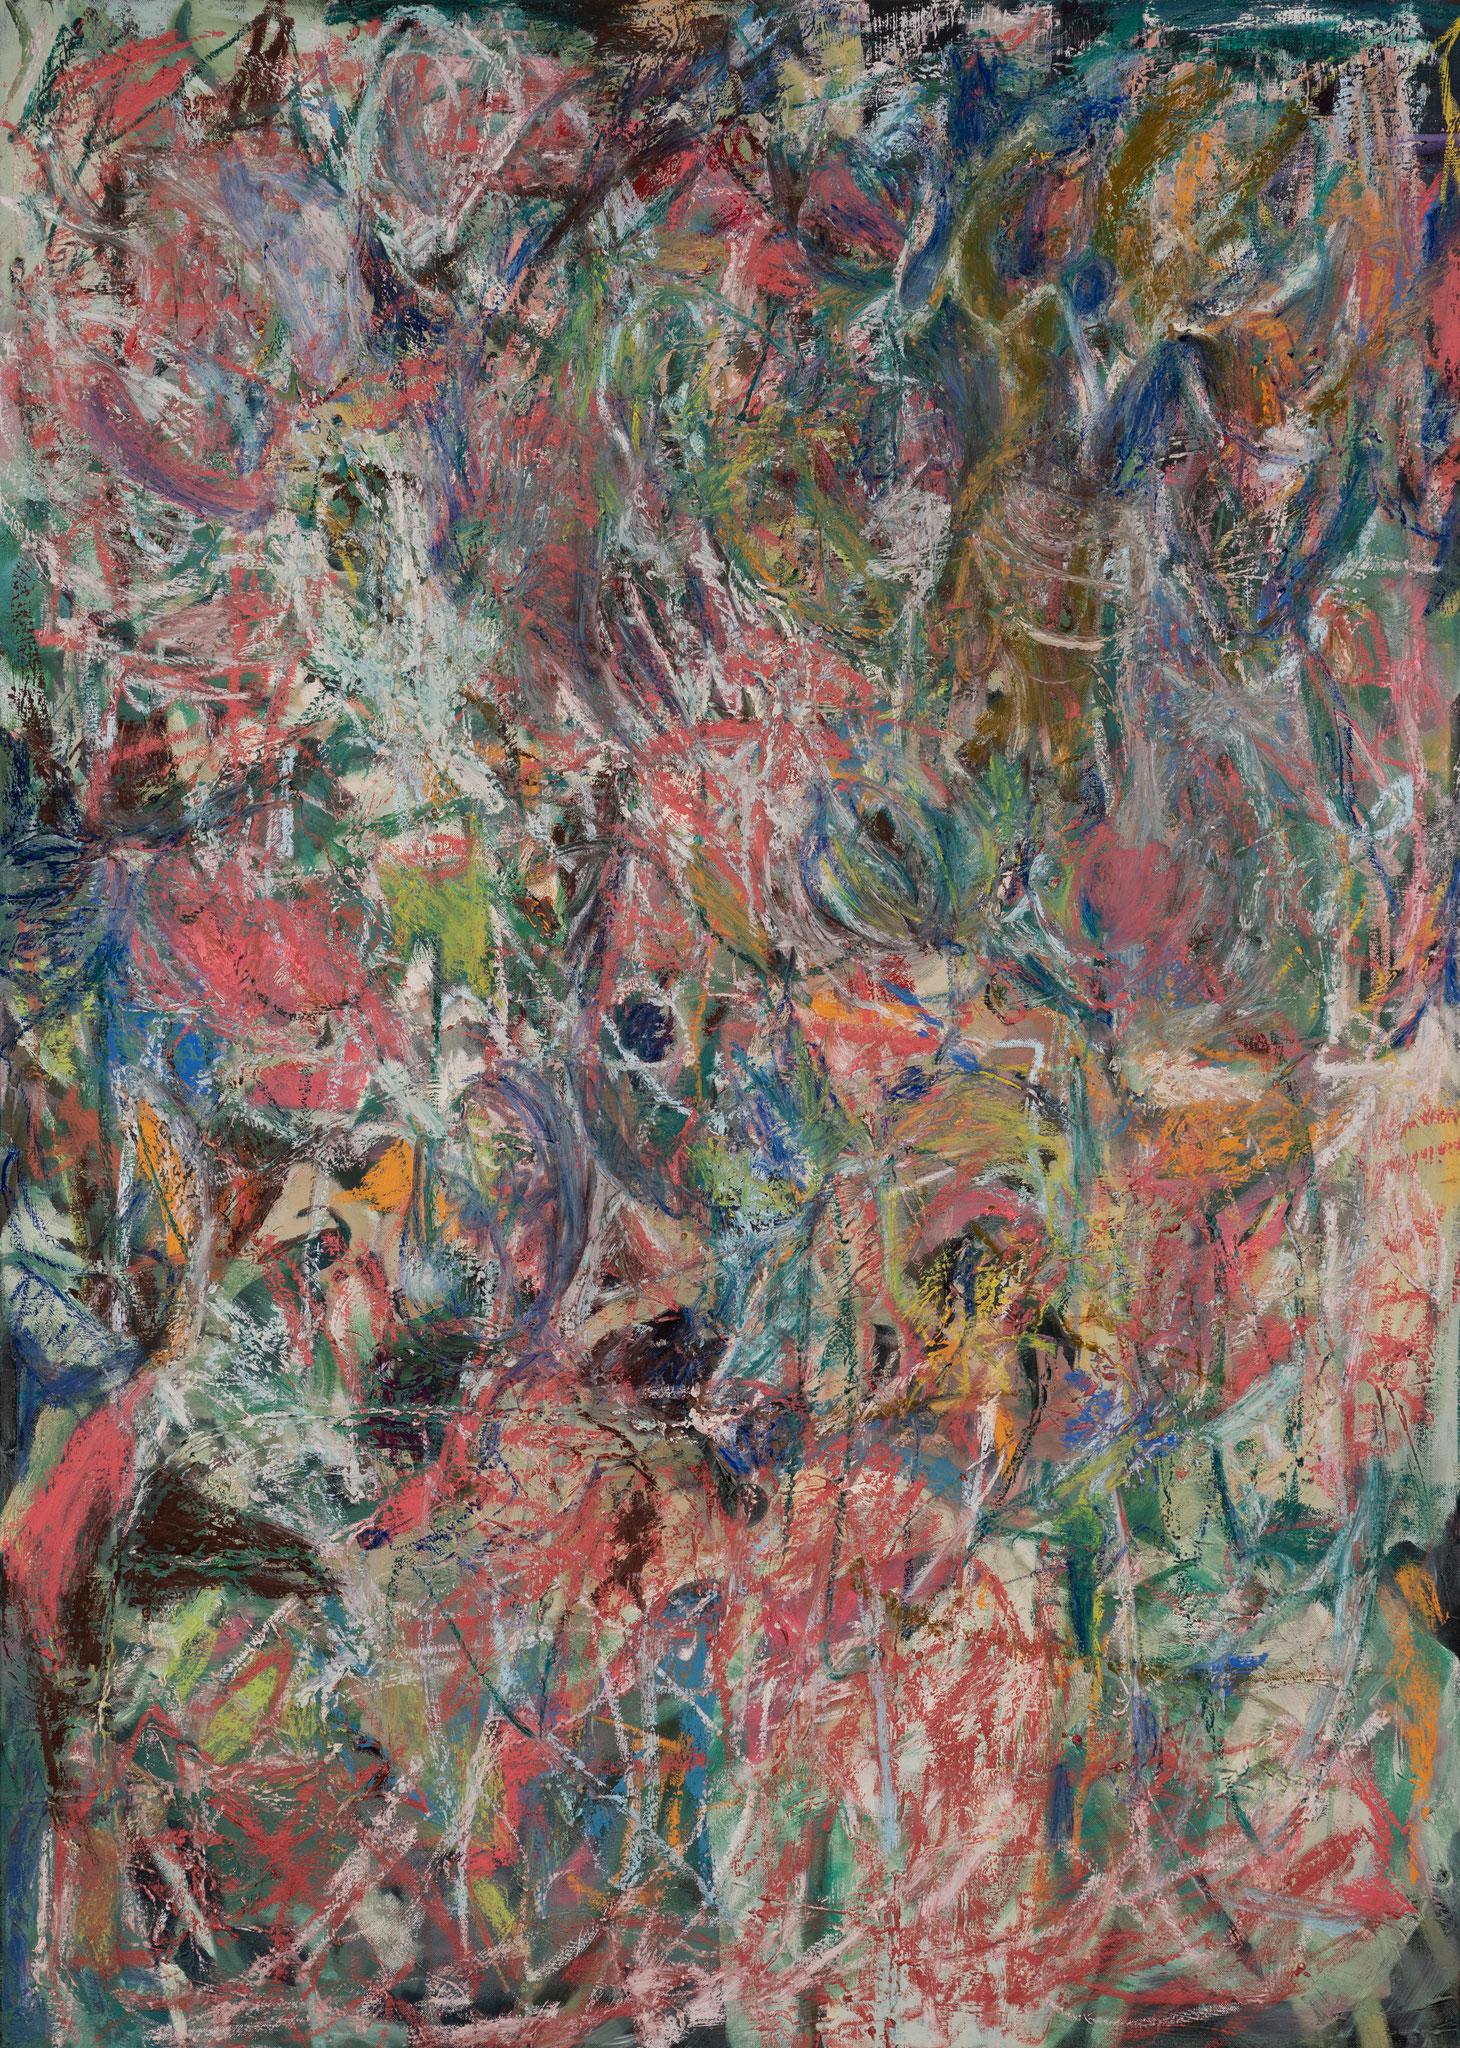 """Emotion"" 140 x 100 cm - Mischtechnik Öl/Ölkreide"